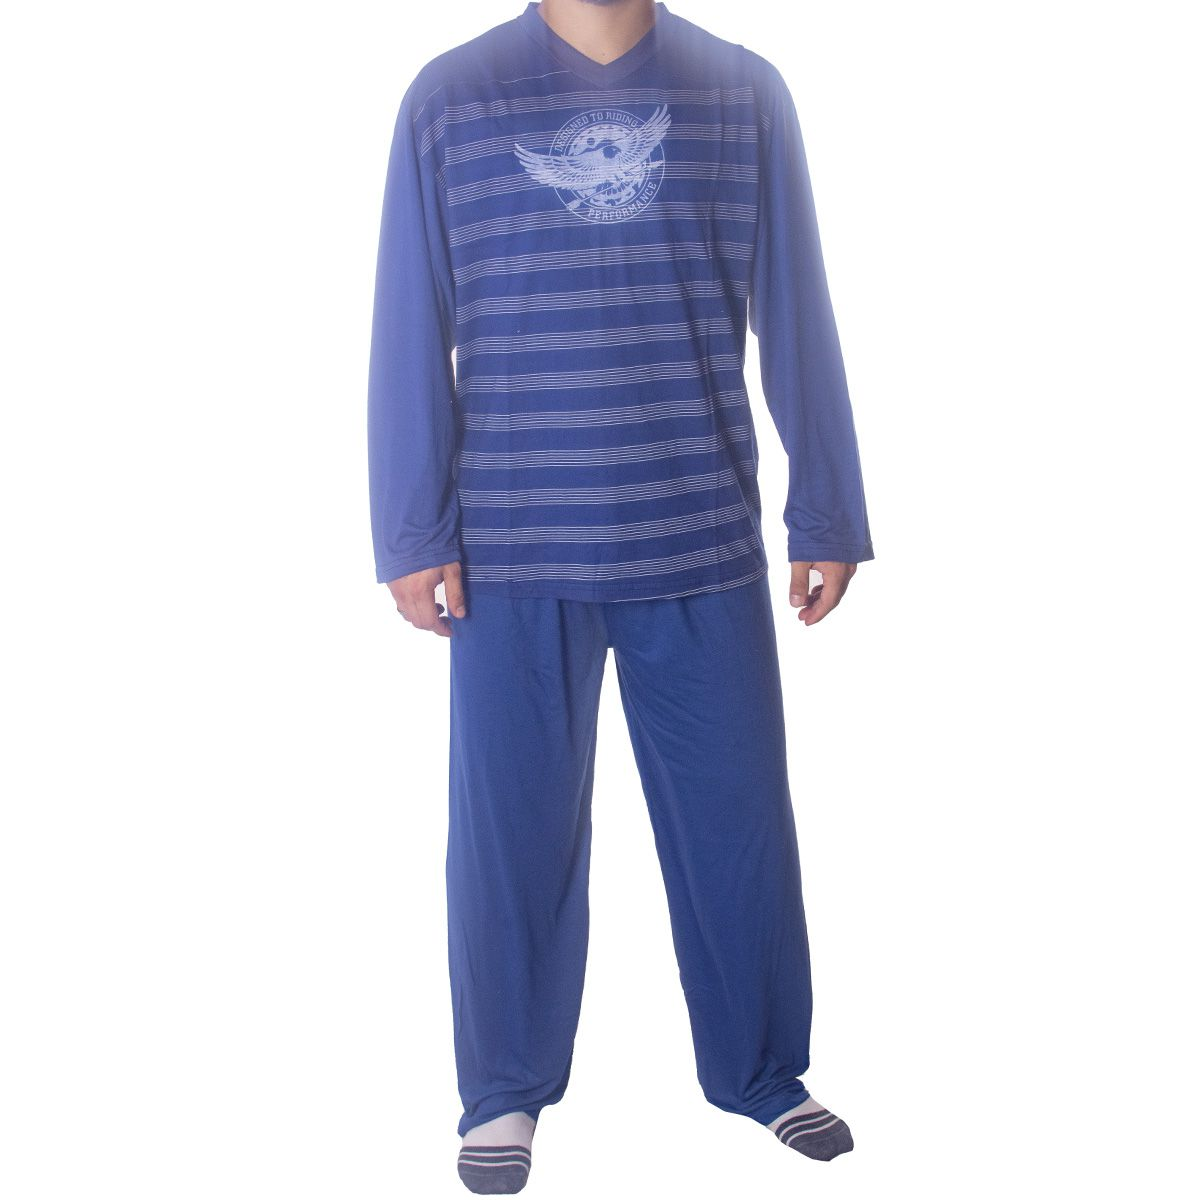 Pijama para o inverno masculino listrado Victory